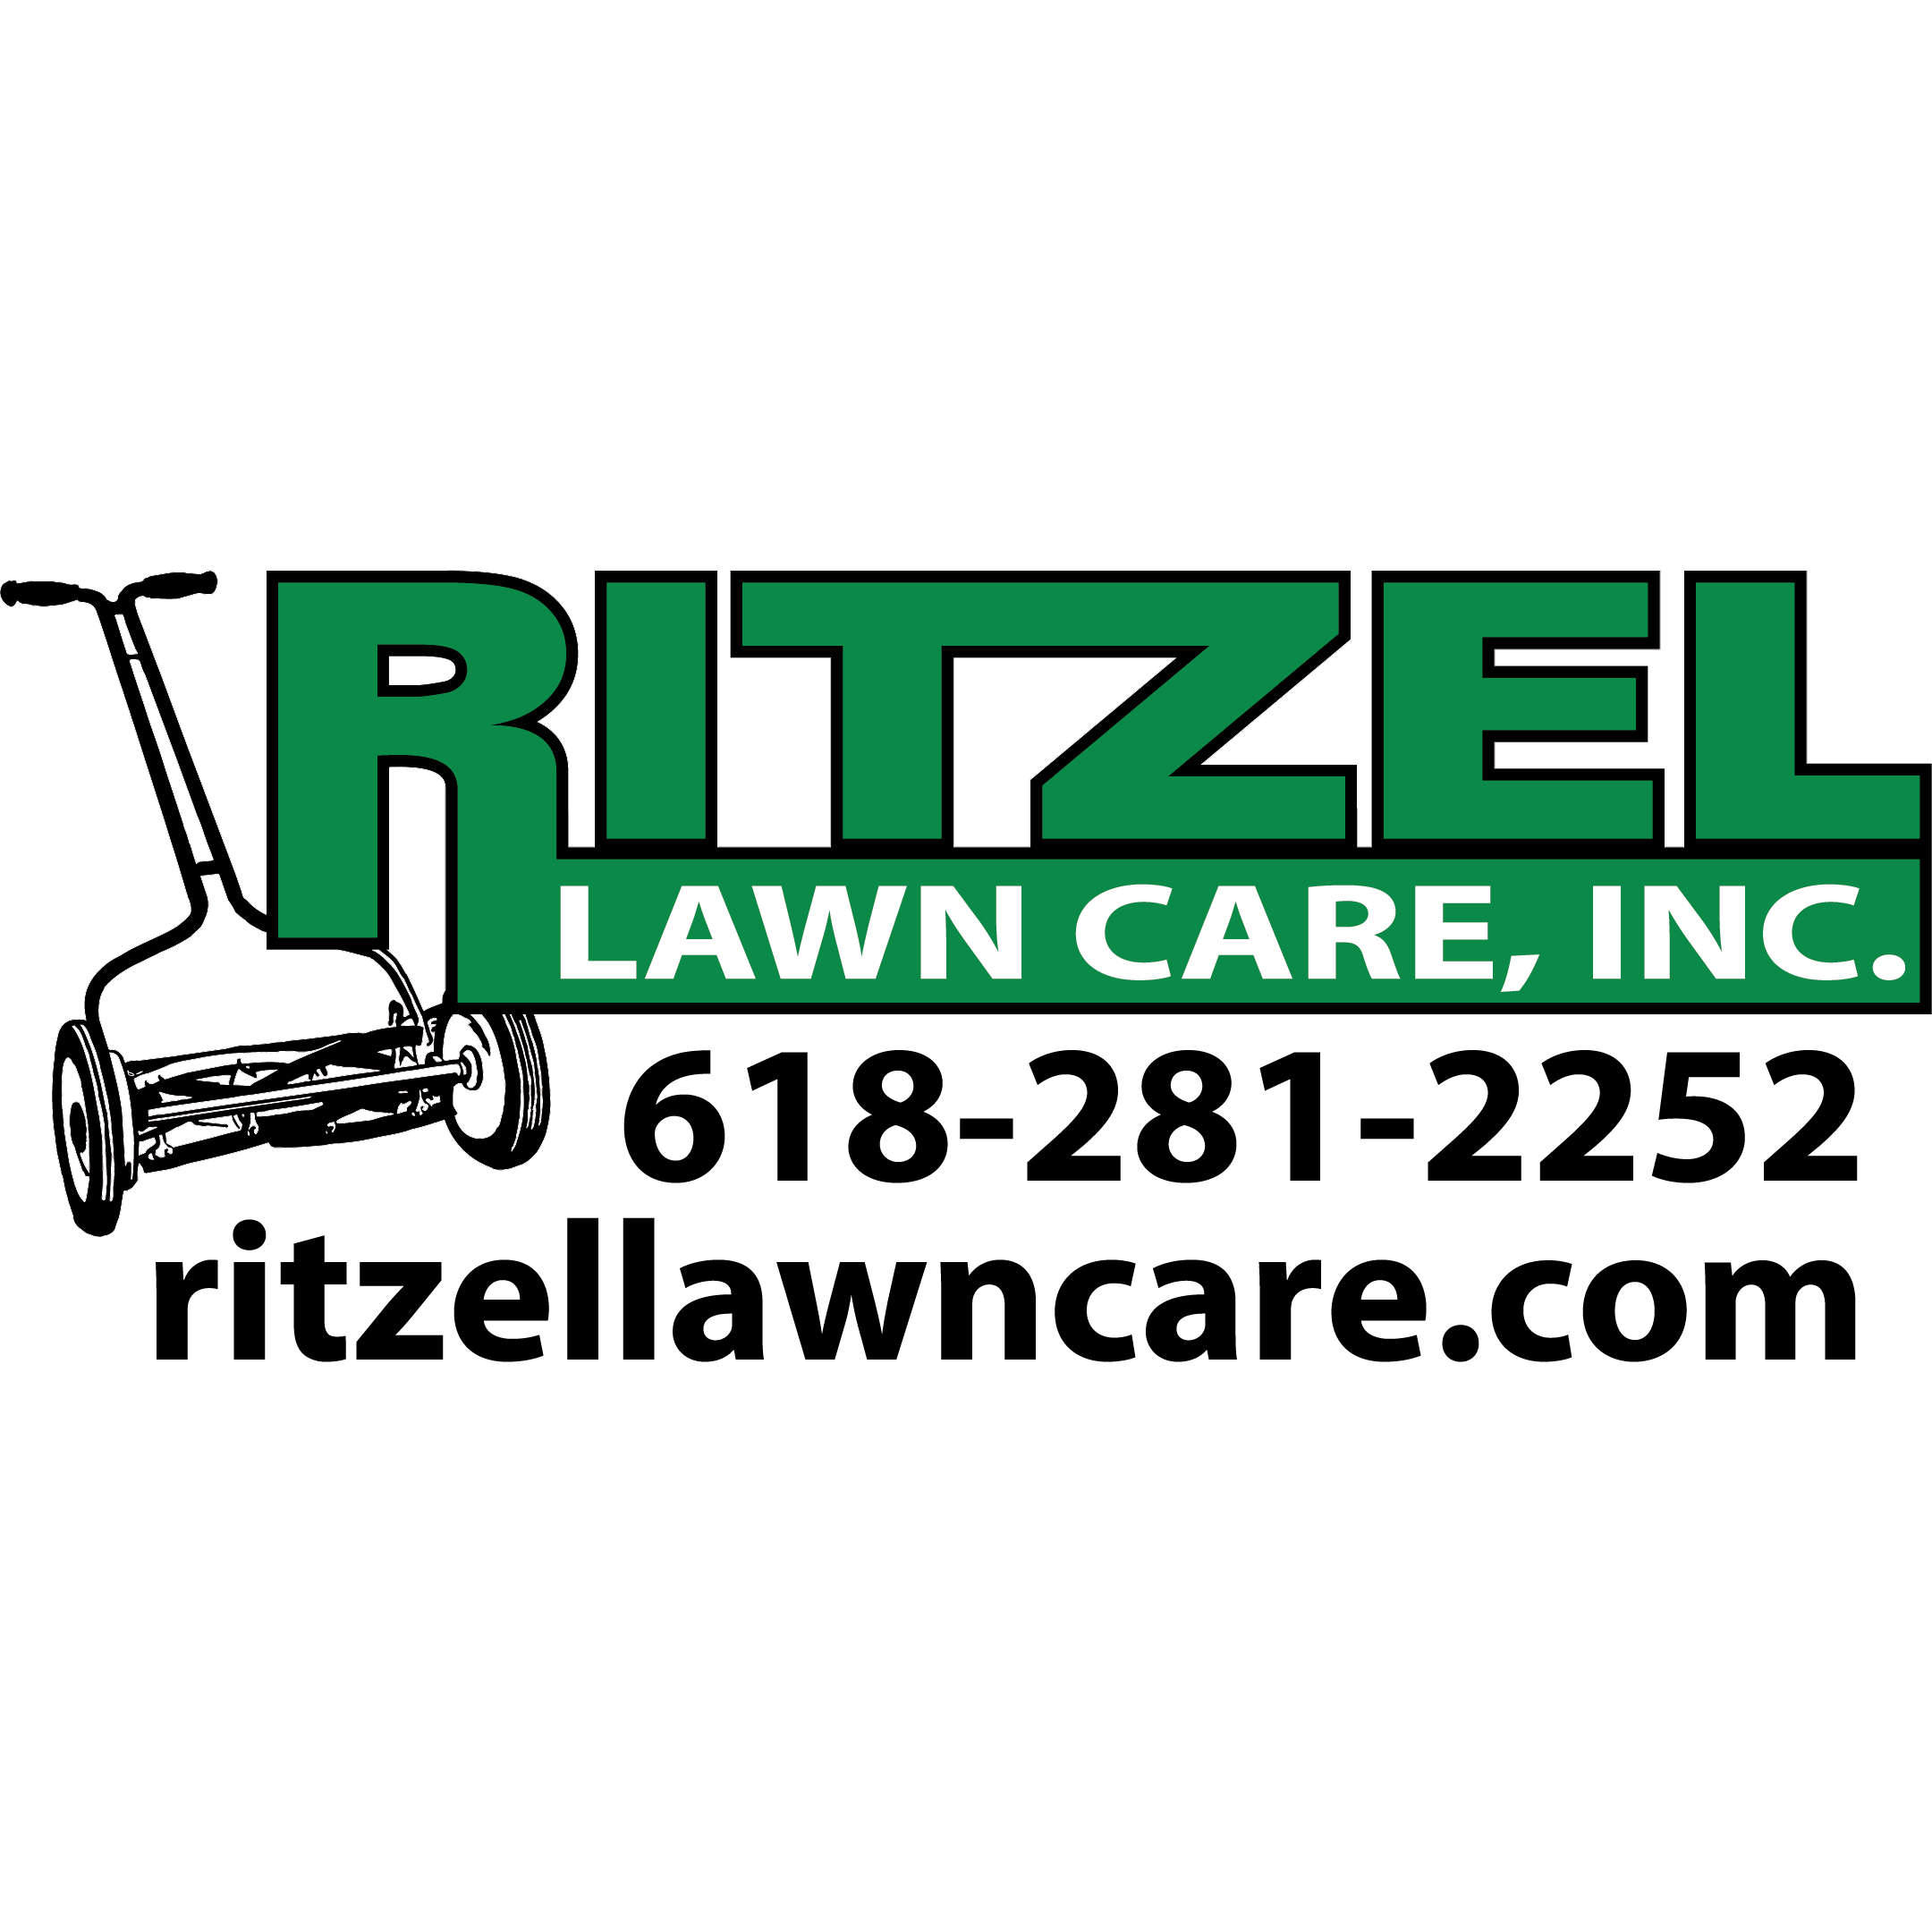 Ritzel Lawn Care, Inc. image 3